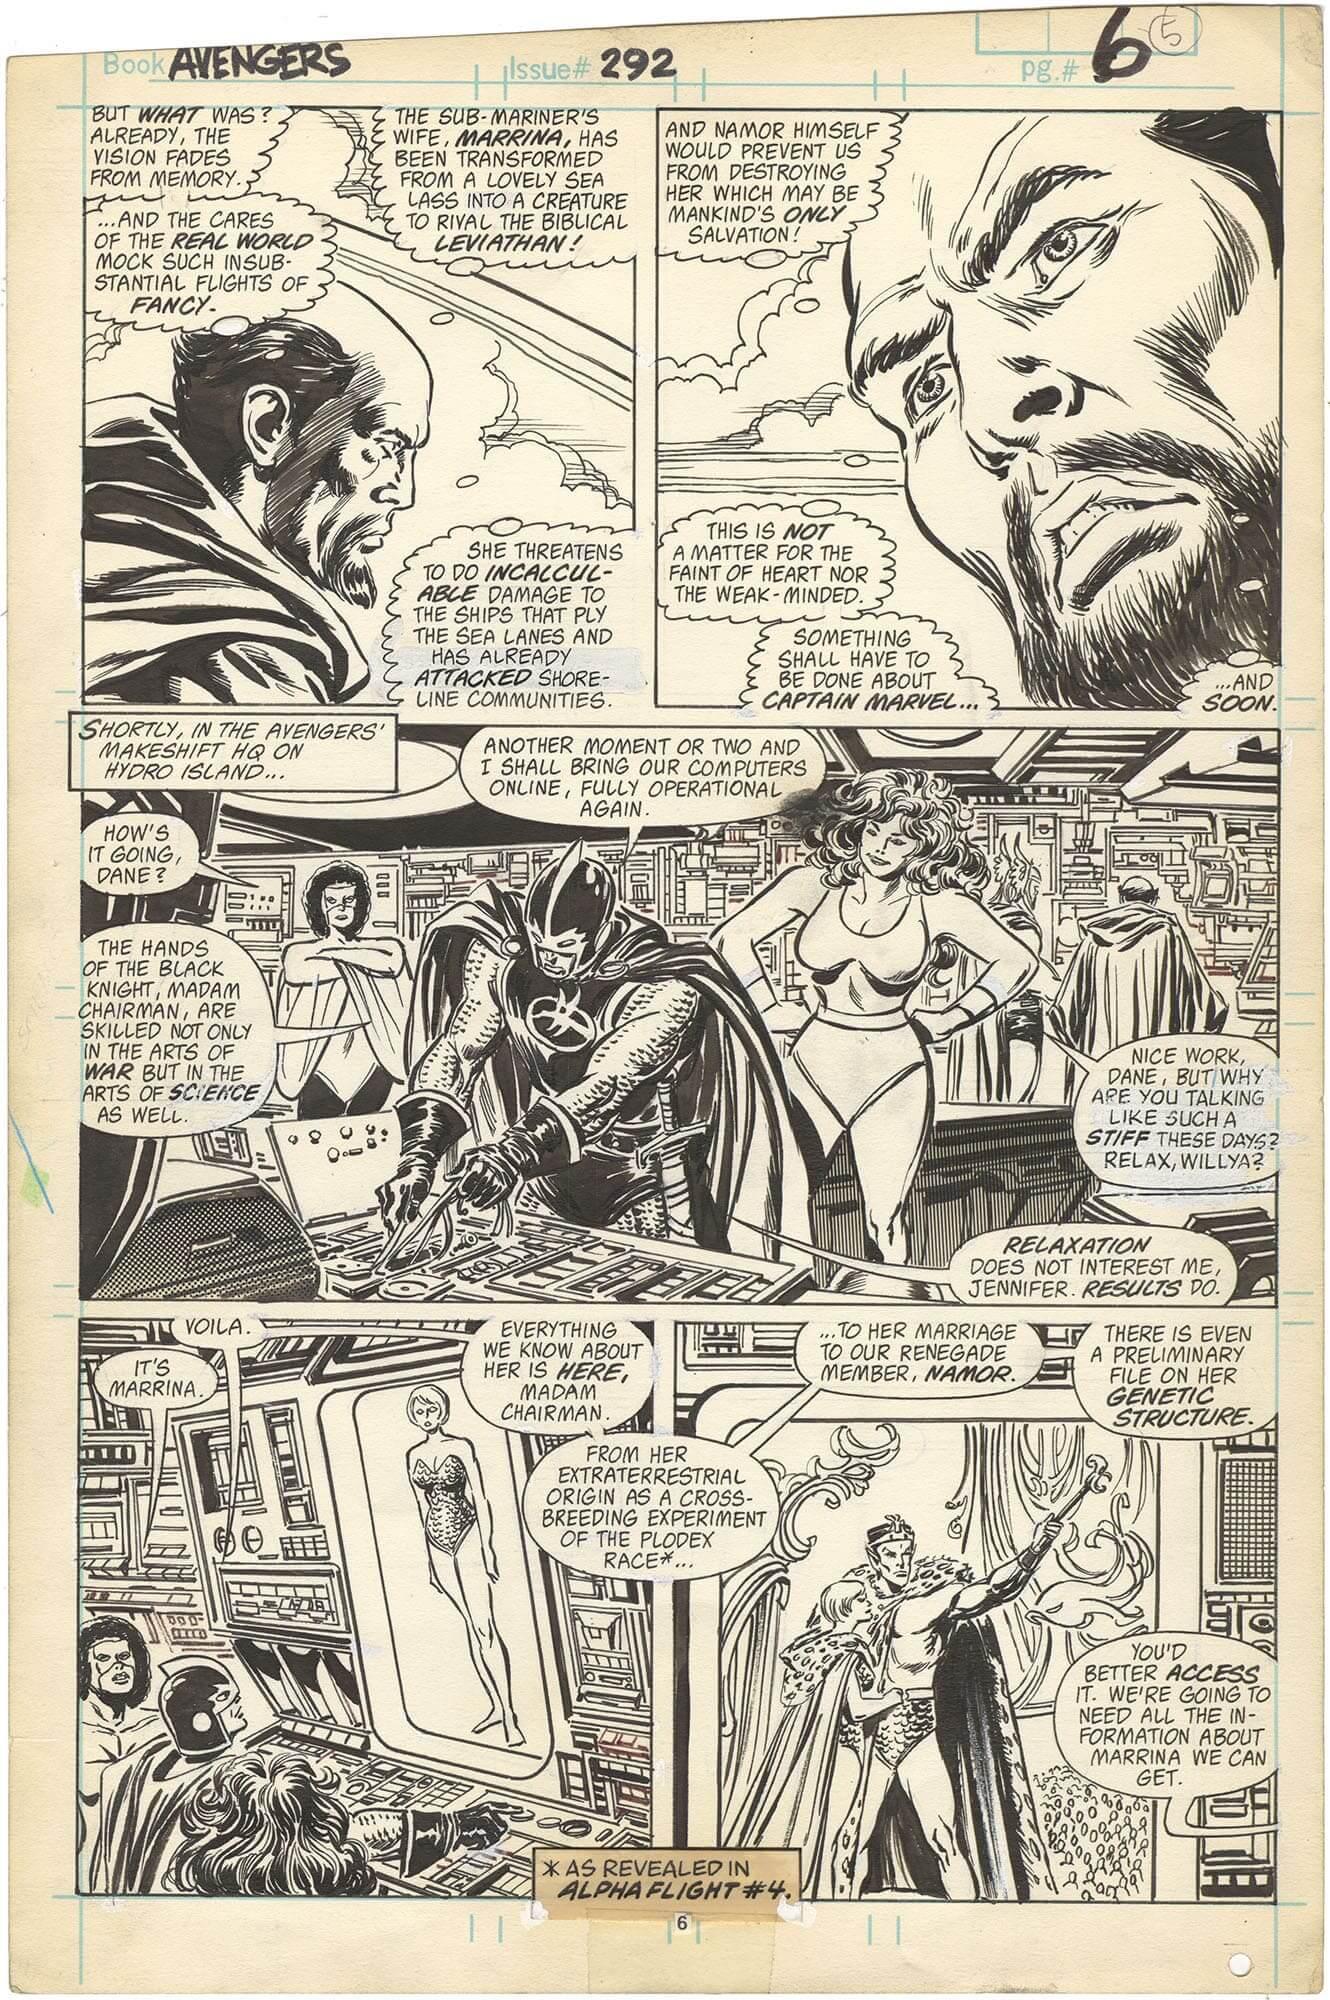 Avengers #292 p6